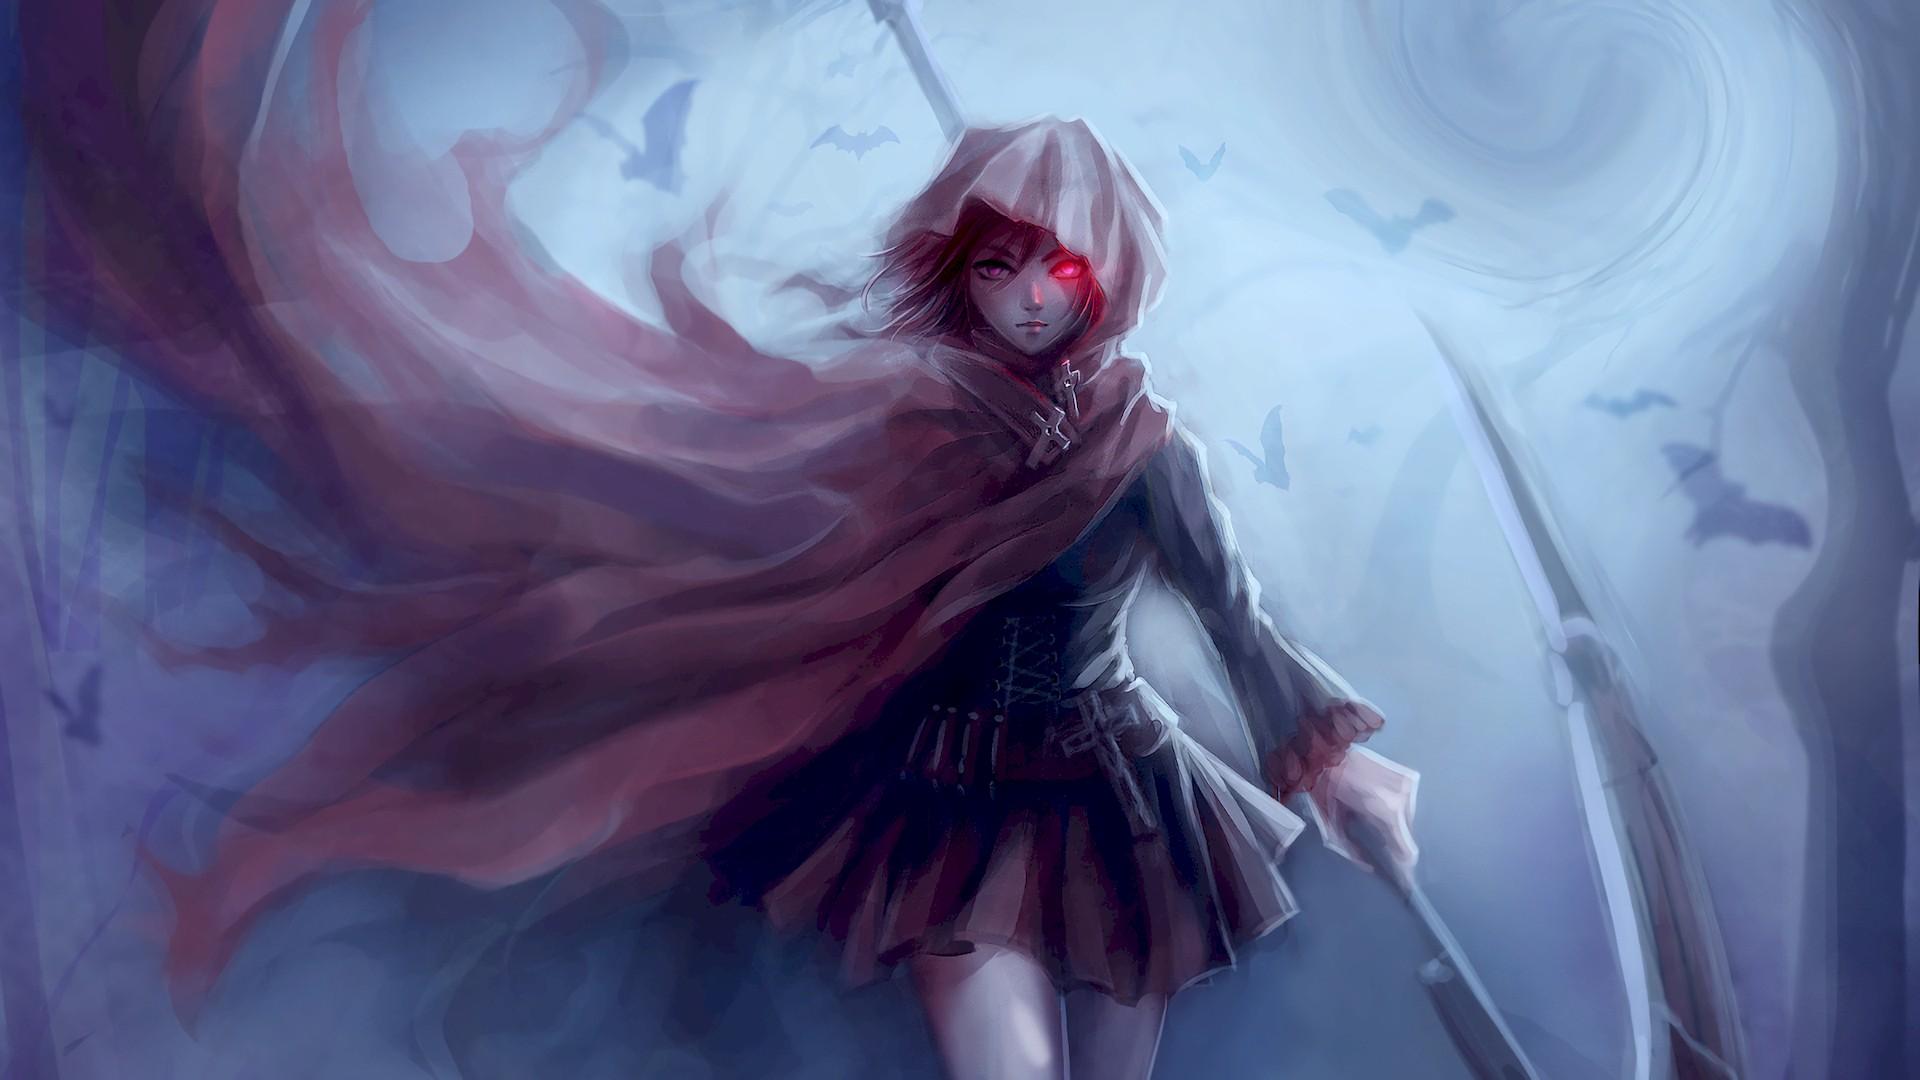 Cute Anime Alone Wallpaper Ruby Rose Rwby Wallpaper 183 ① Download Free Beautiful